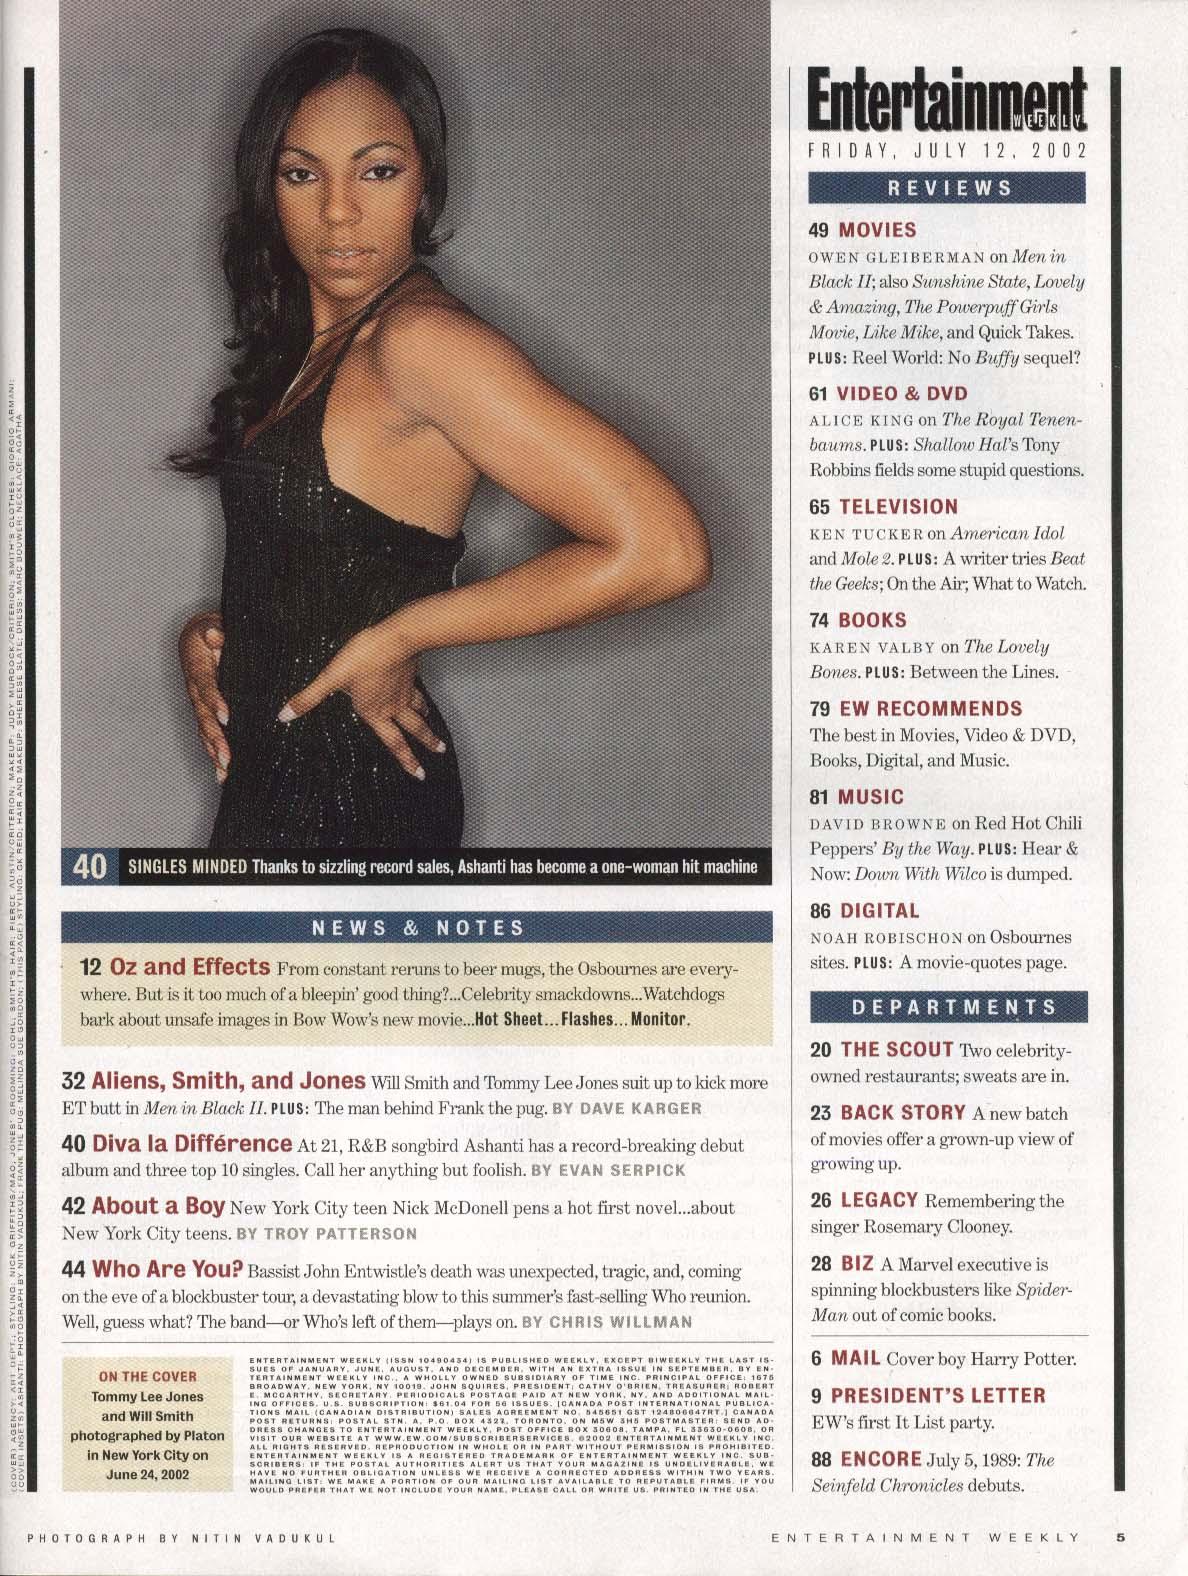 ENTERTAINMENT WEEKLY Tommy Lee Jones Will Smith Ashanti John Entwistle 7/12 2002